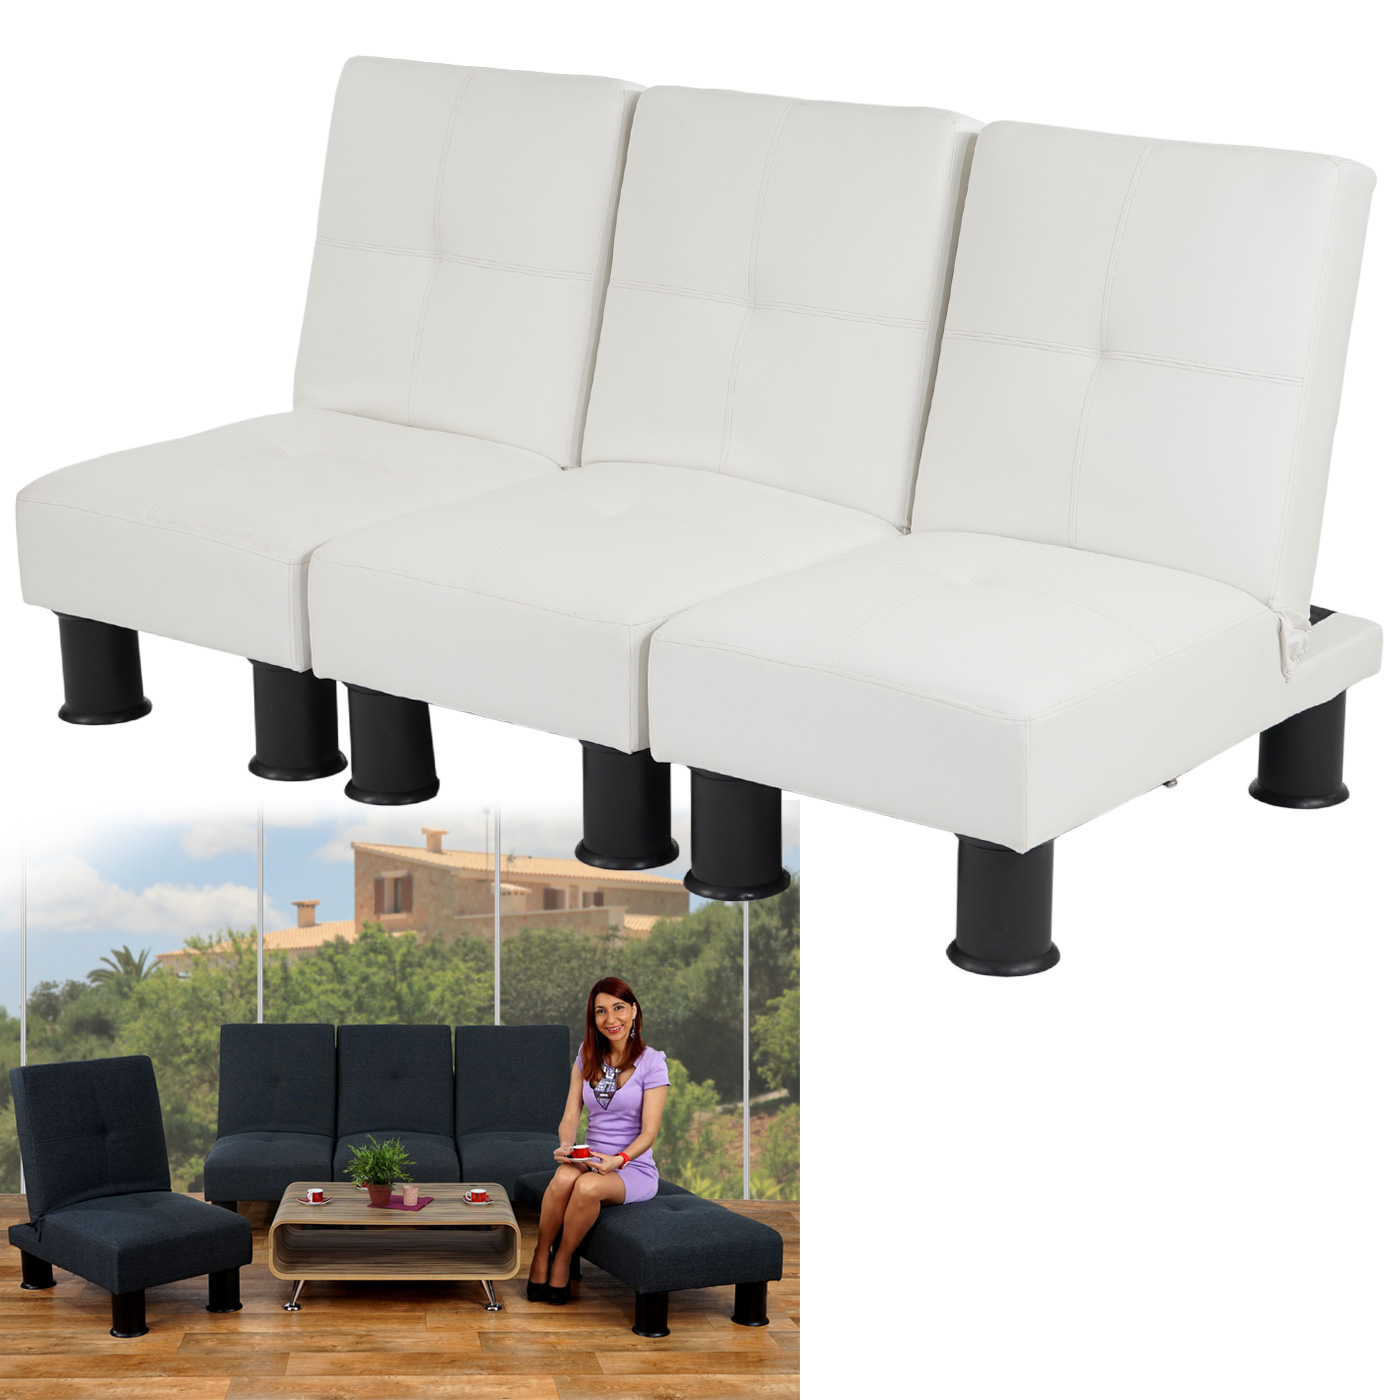 3x sessel relaxliege sofa schlafcouch g stebett melbourne ii kunstleder textil ebay. Black Bedroom Furniture Sets. Home Design Ideas